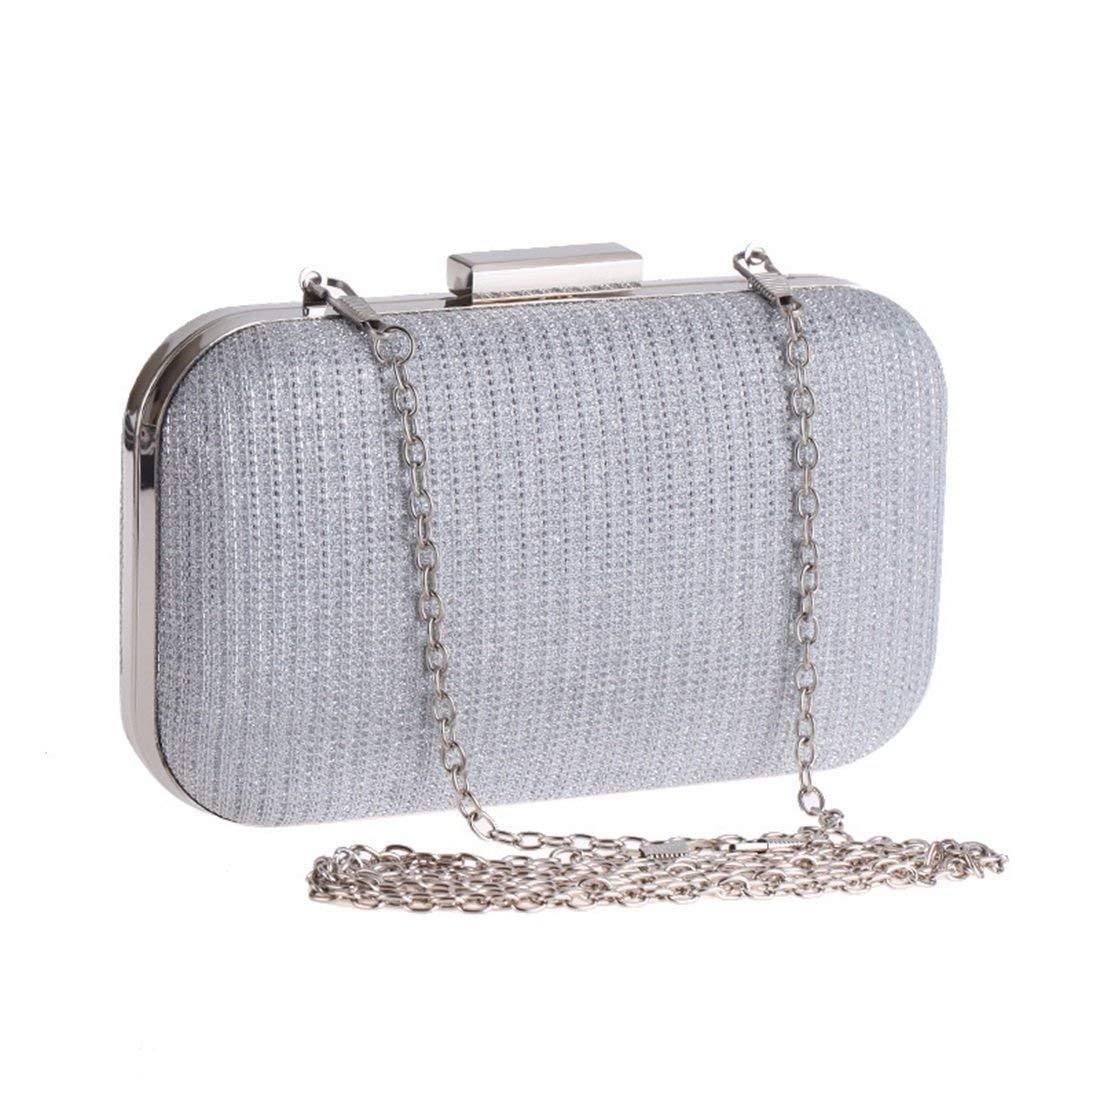 3e268c25c1f4 Goooodrry Women's Evening Party Clutch Bag Handbag Chain Small Box Bag  Square Hard Shell Handbag Shoulder Evening Bag (Color : Black)